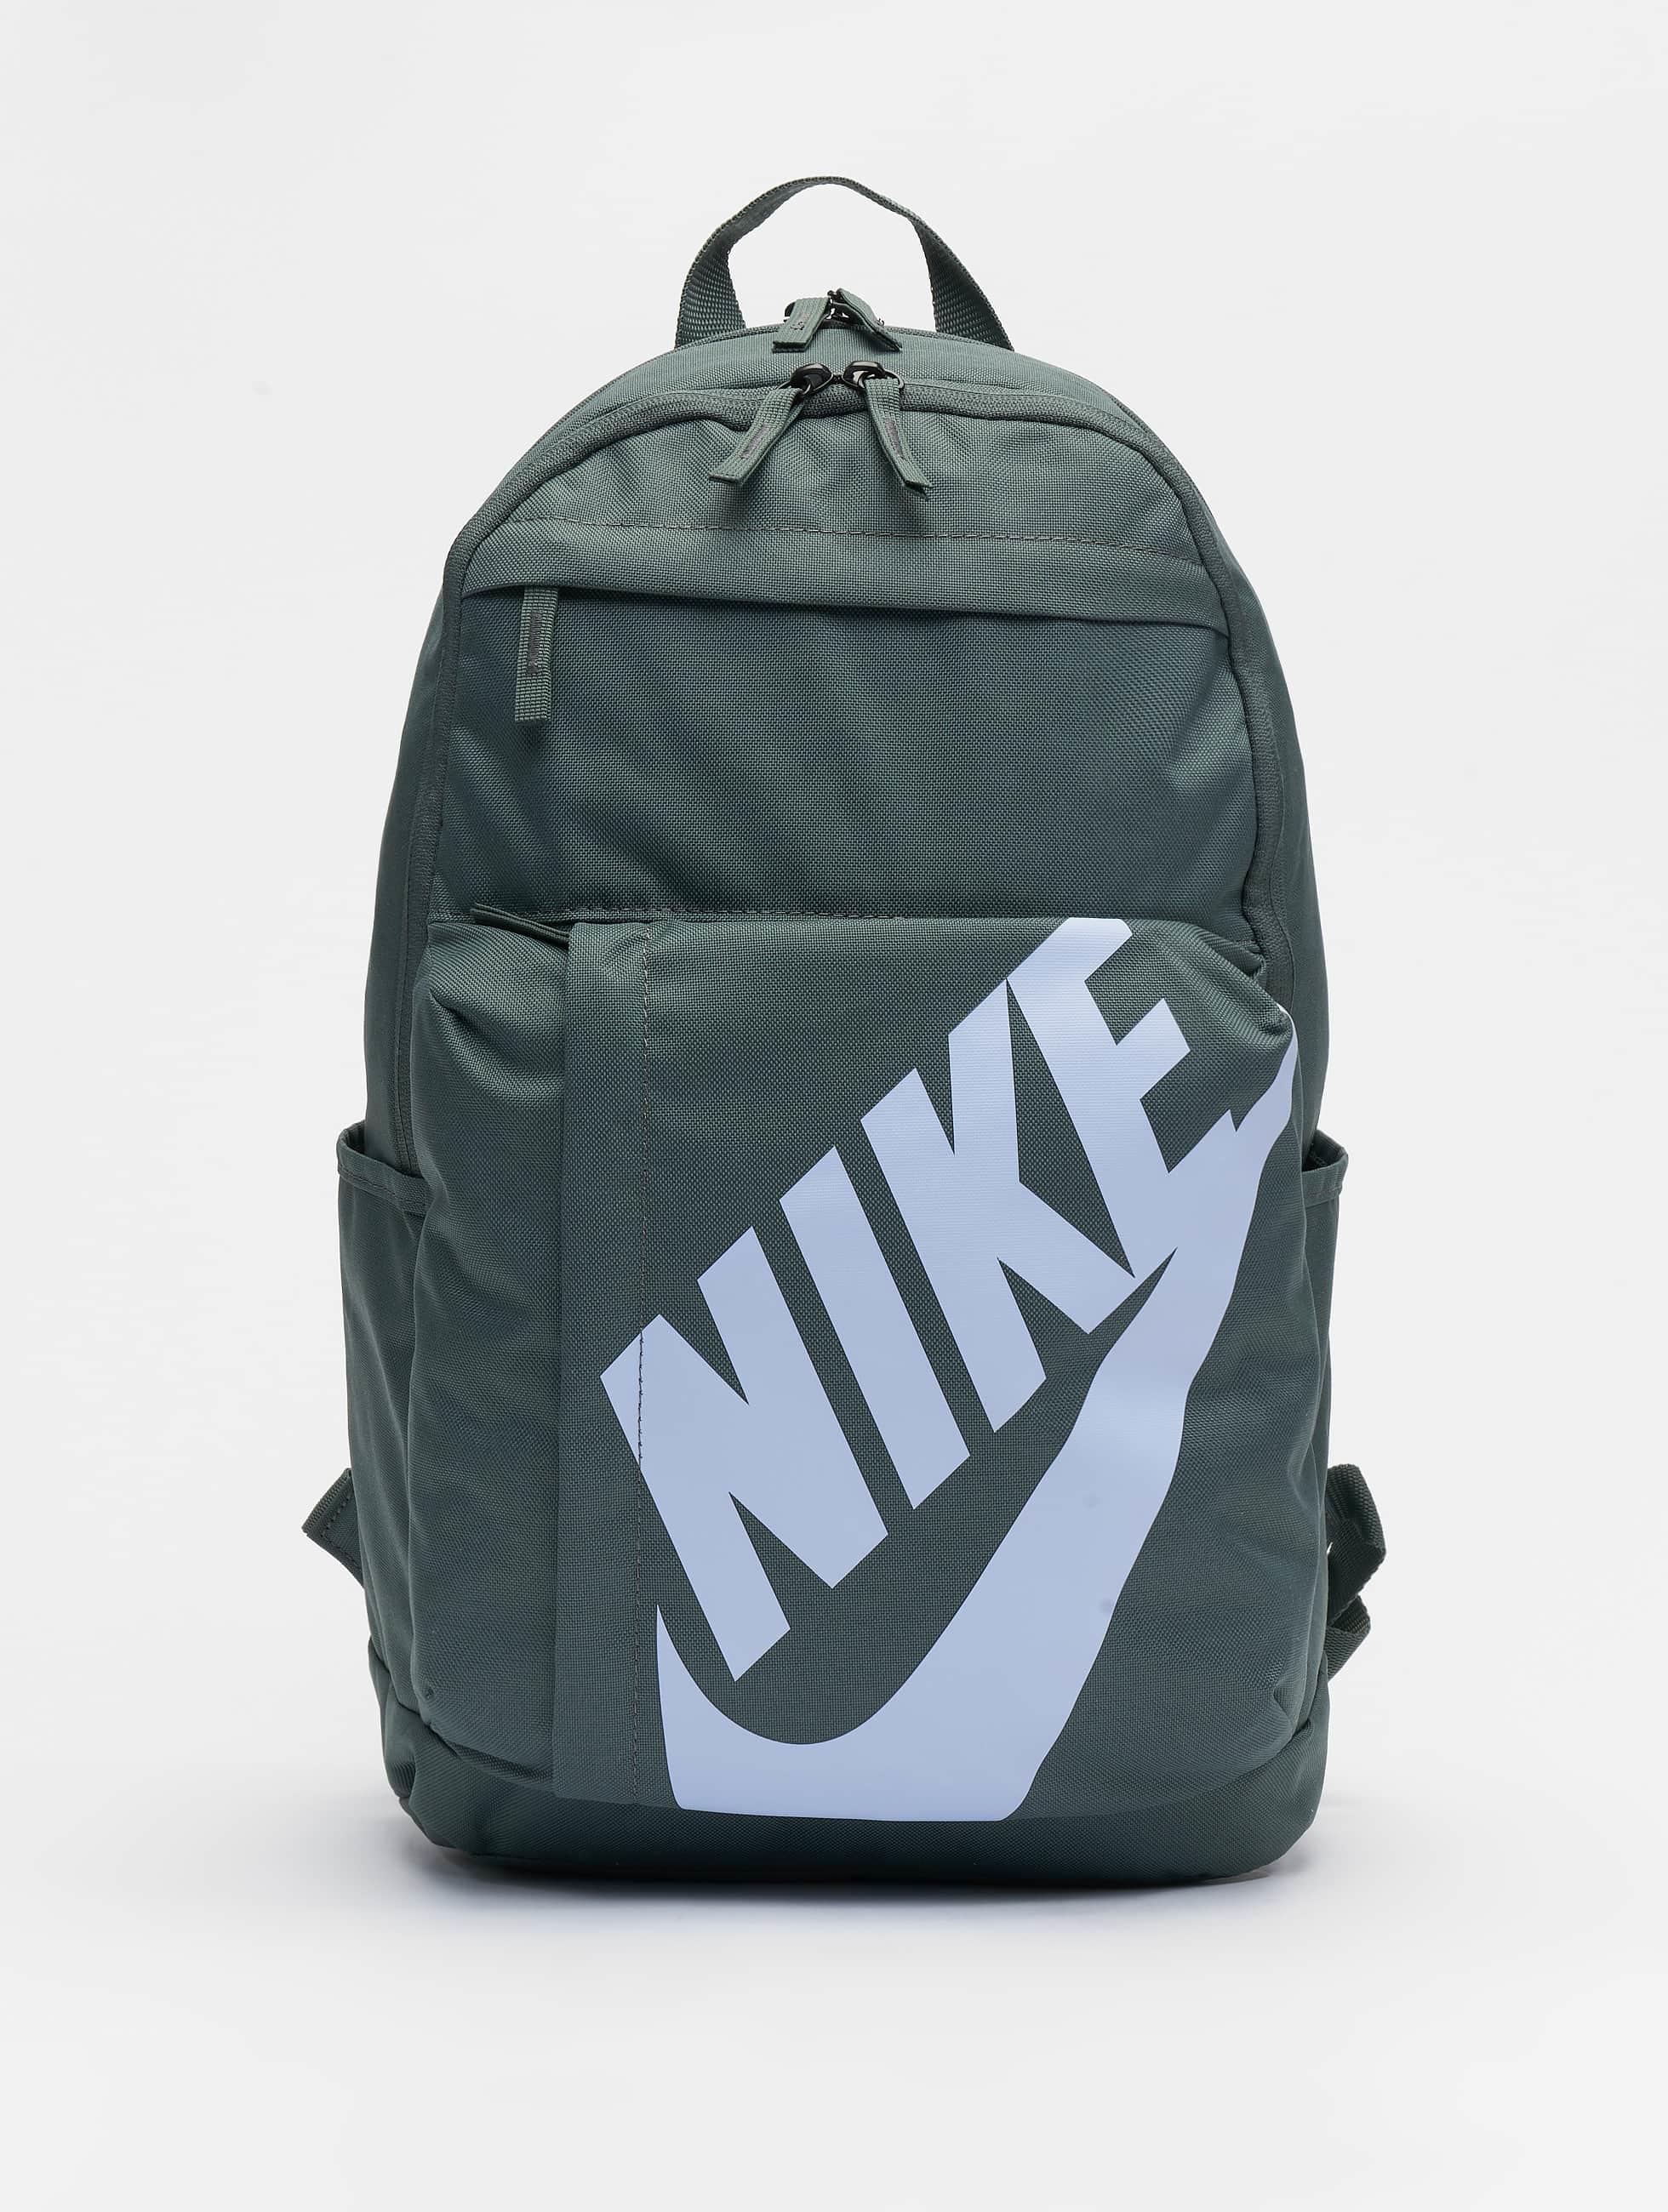 3d5492998ee Nike SB Accessoires / rugzak Elemental in bont 669375